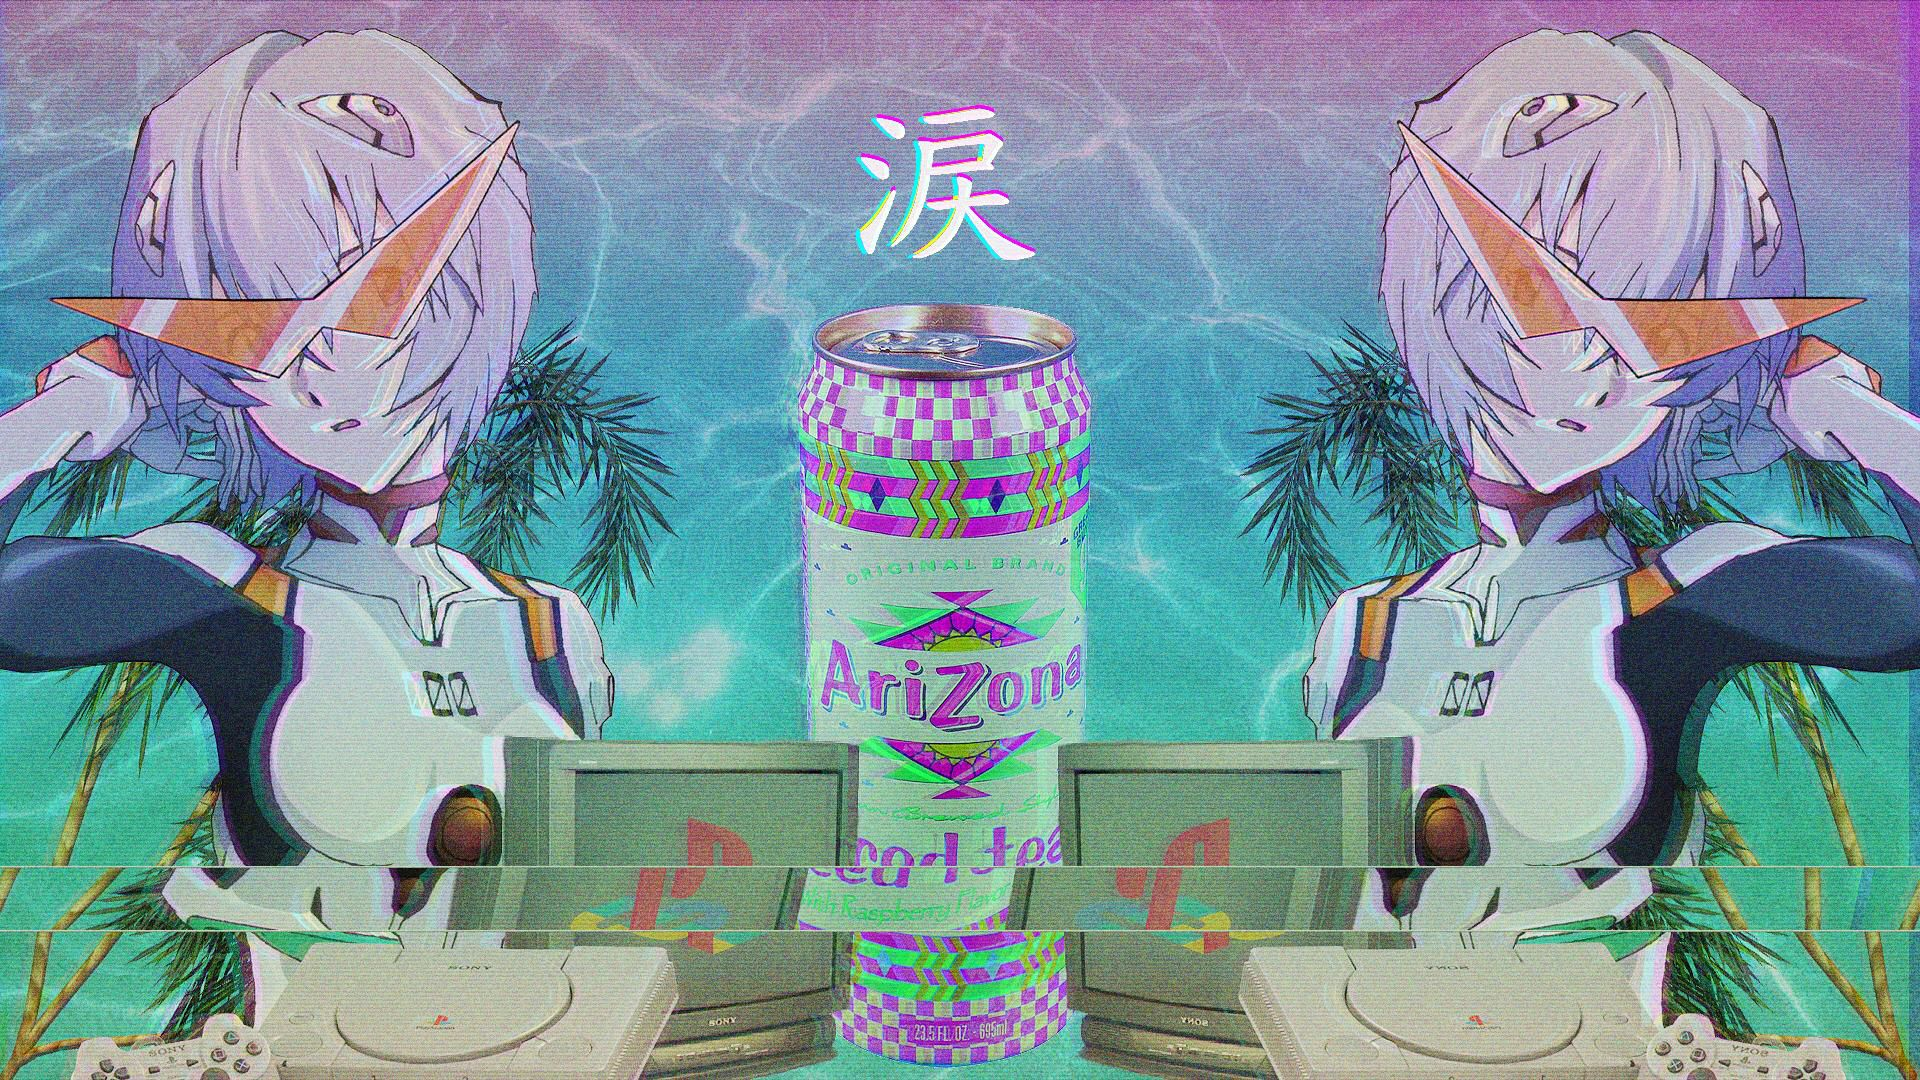 Pin by ♡ on NGE:rei | Vaporwave wallpaper, Anime wallpaper ...